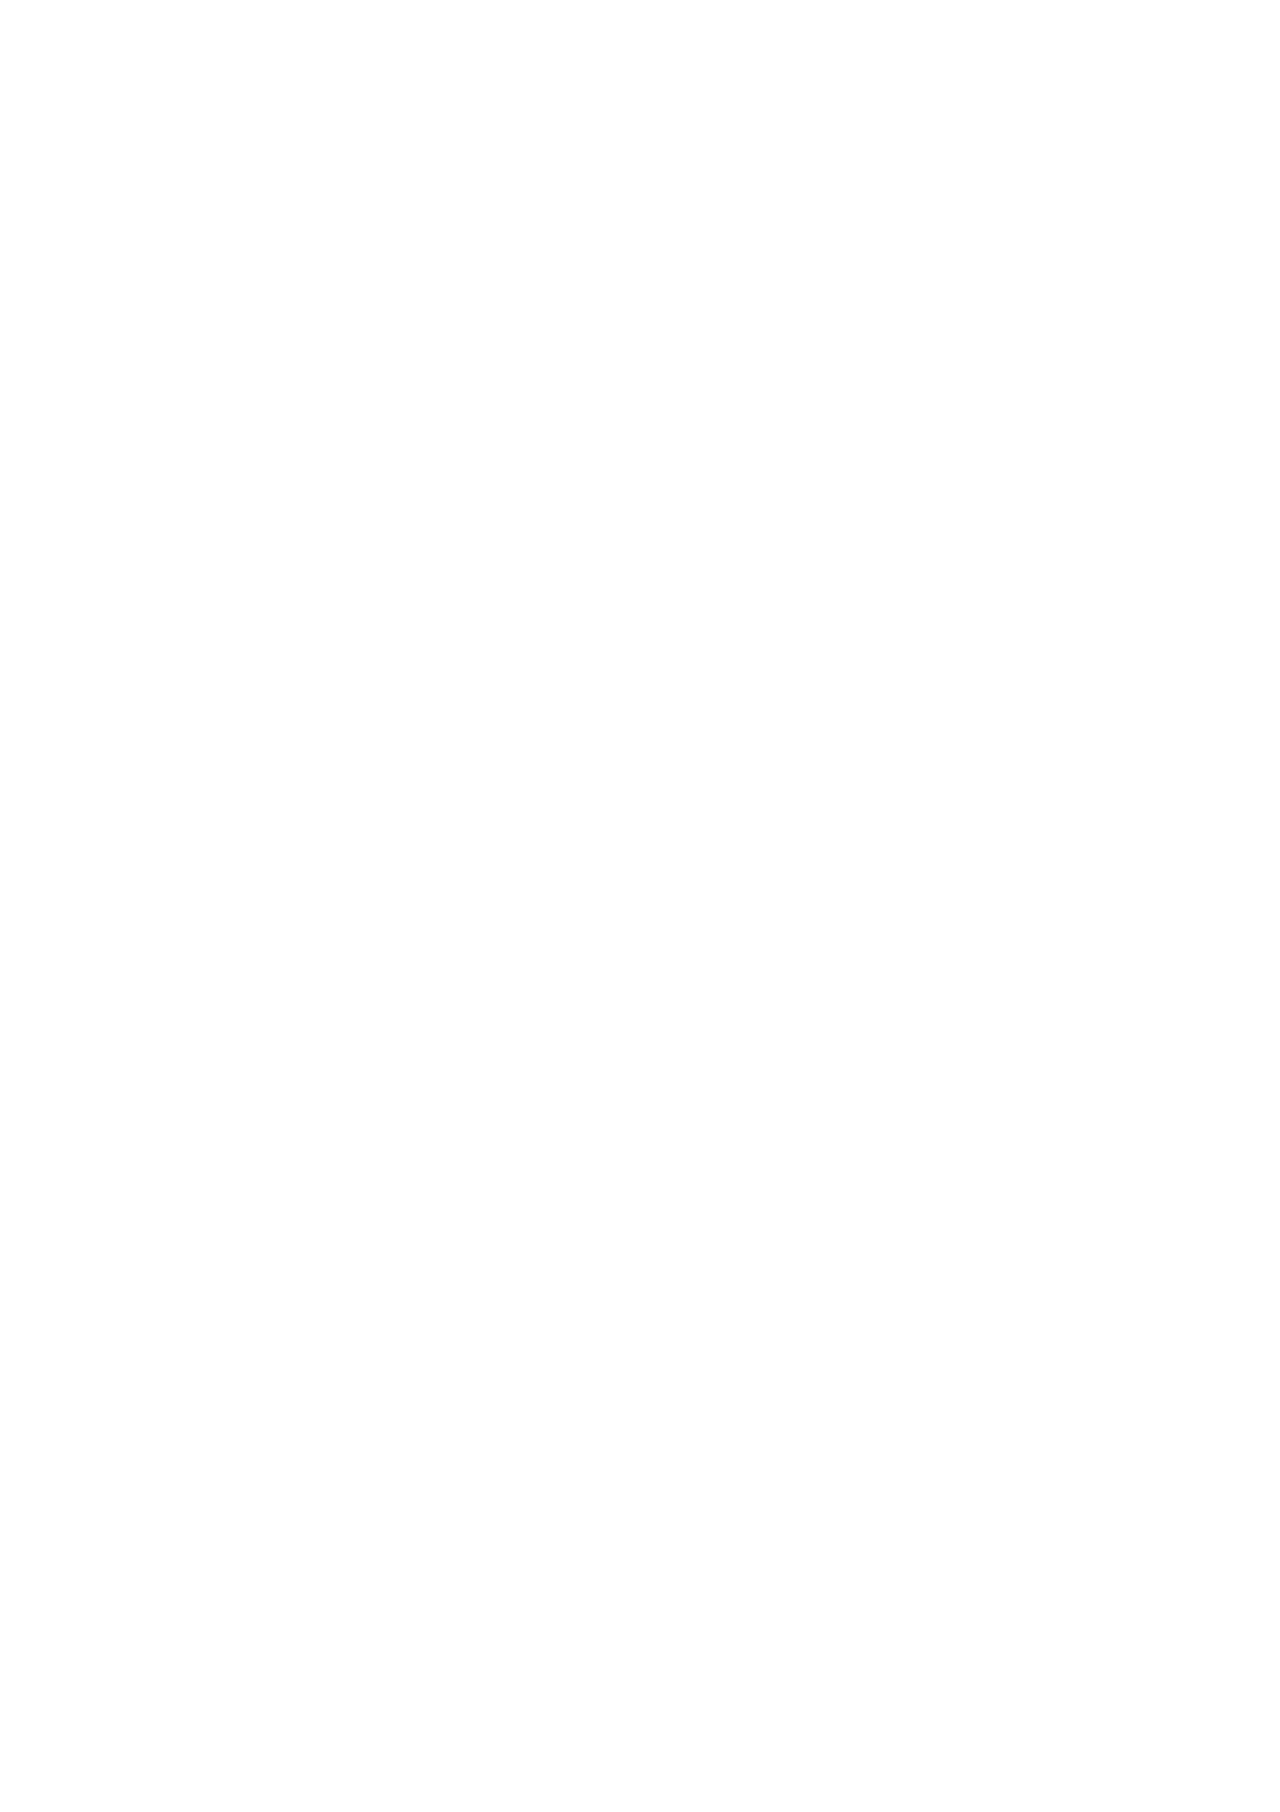 [Pleats Time (Nunnu)] Sister Breeding 2 - Gimai Tsukimiya Mirai Aokan Choukyou Hen   Sister Breeding 2 - Outdoor Sex Training Edition with Step-sister Tsukimiya Mirai [English] [Douzo Lad Translations] [Digital] 1